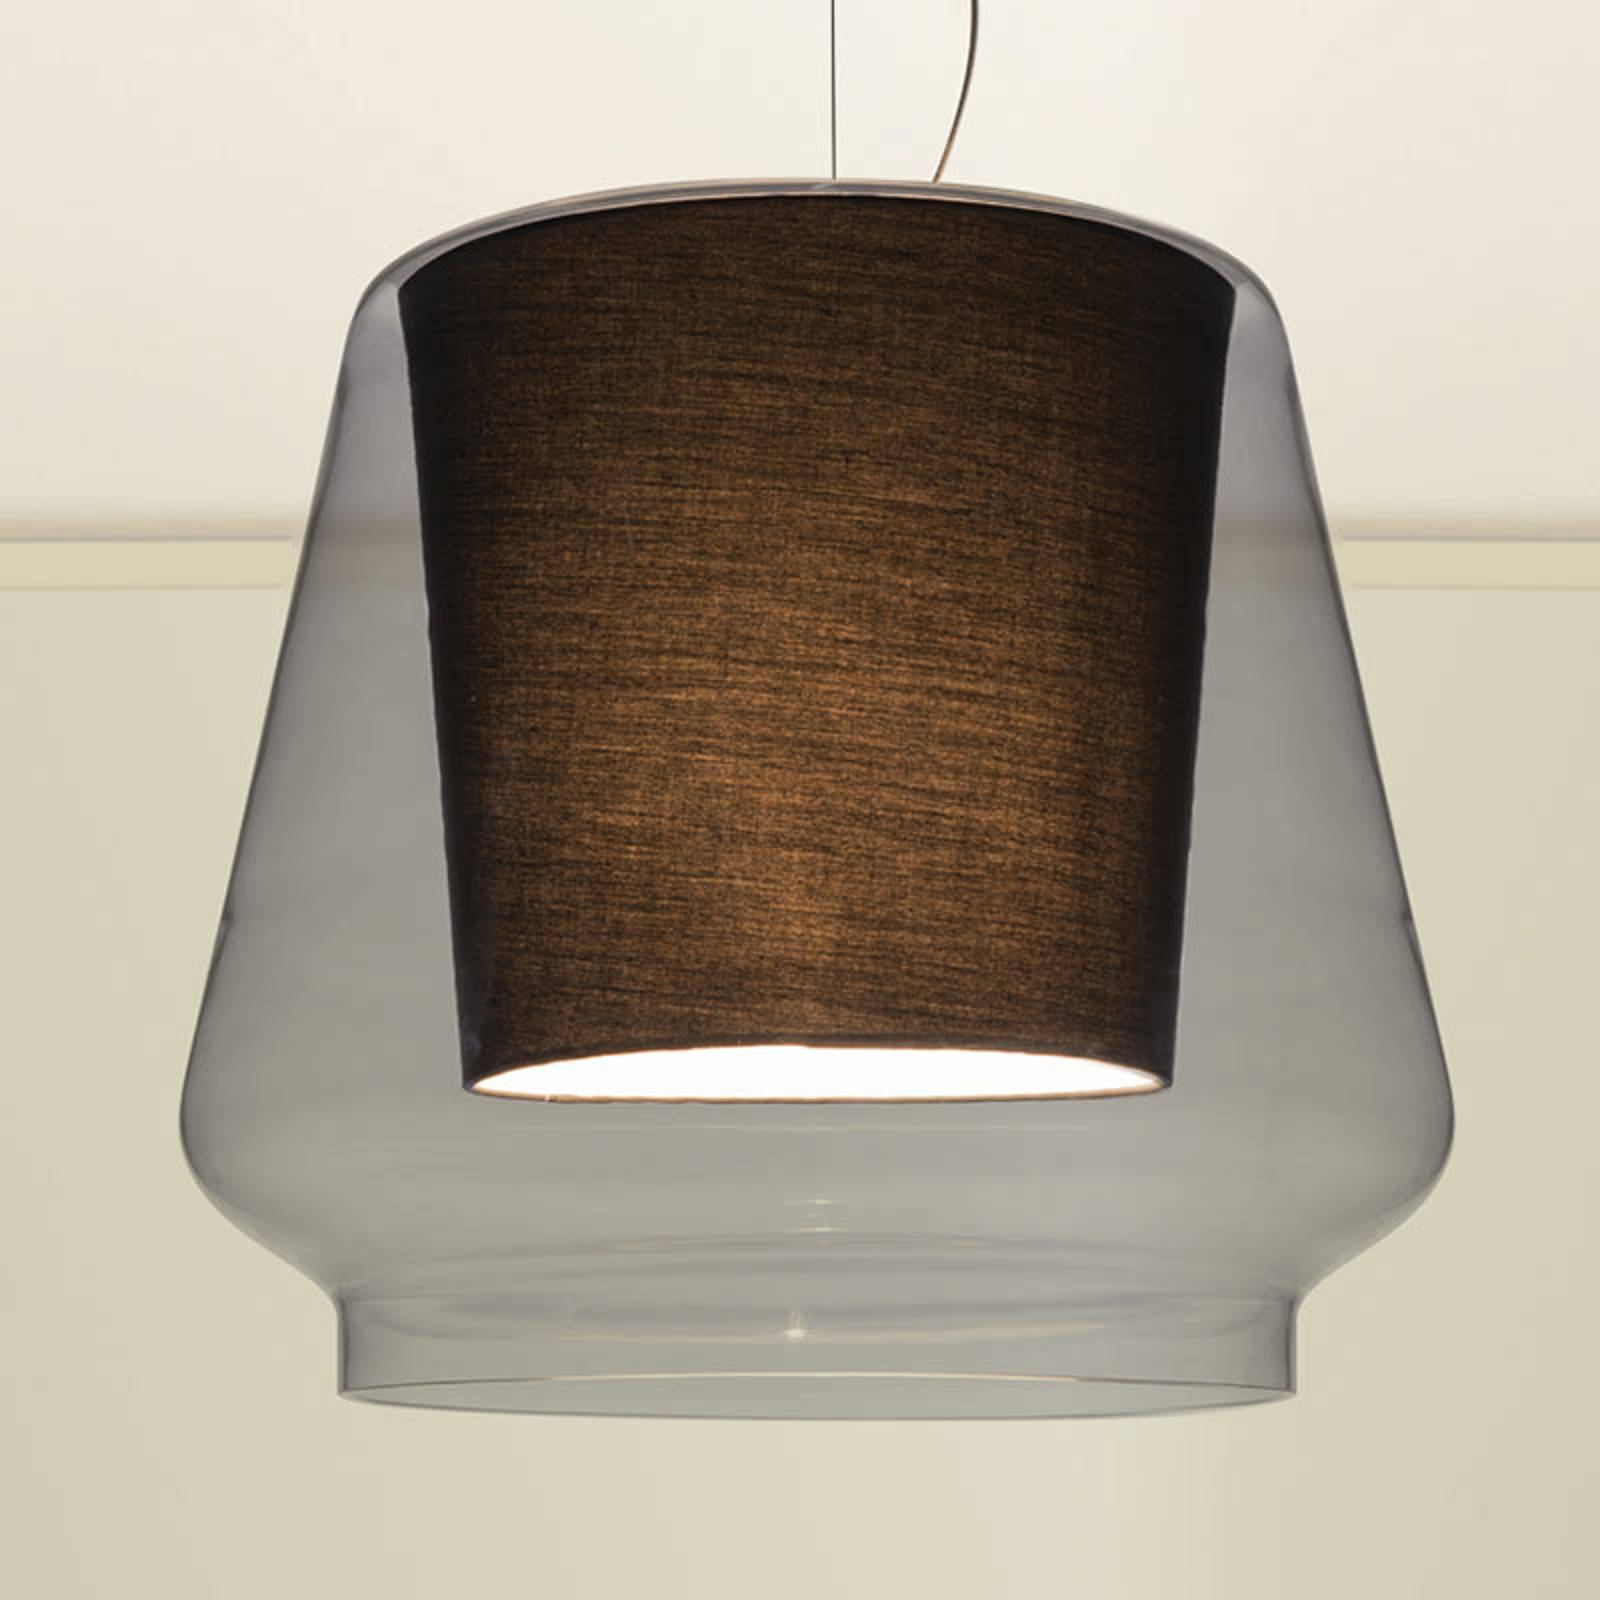 Casablanca Aleve L hanglamp m. rookglas kap